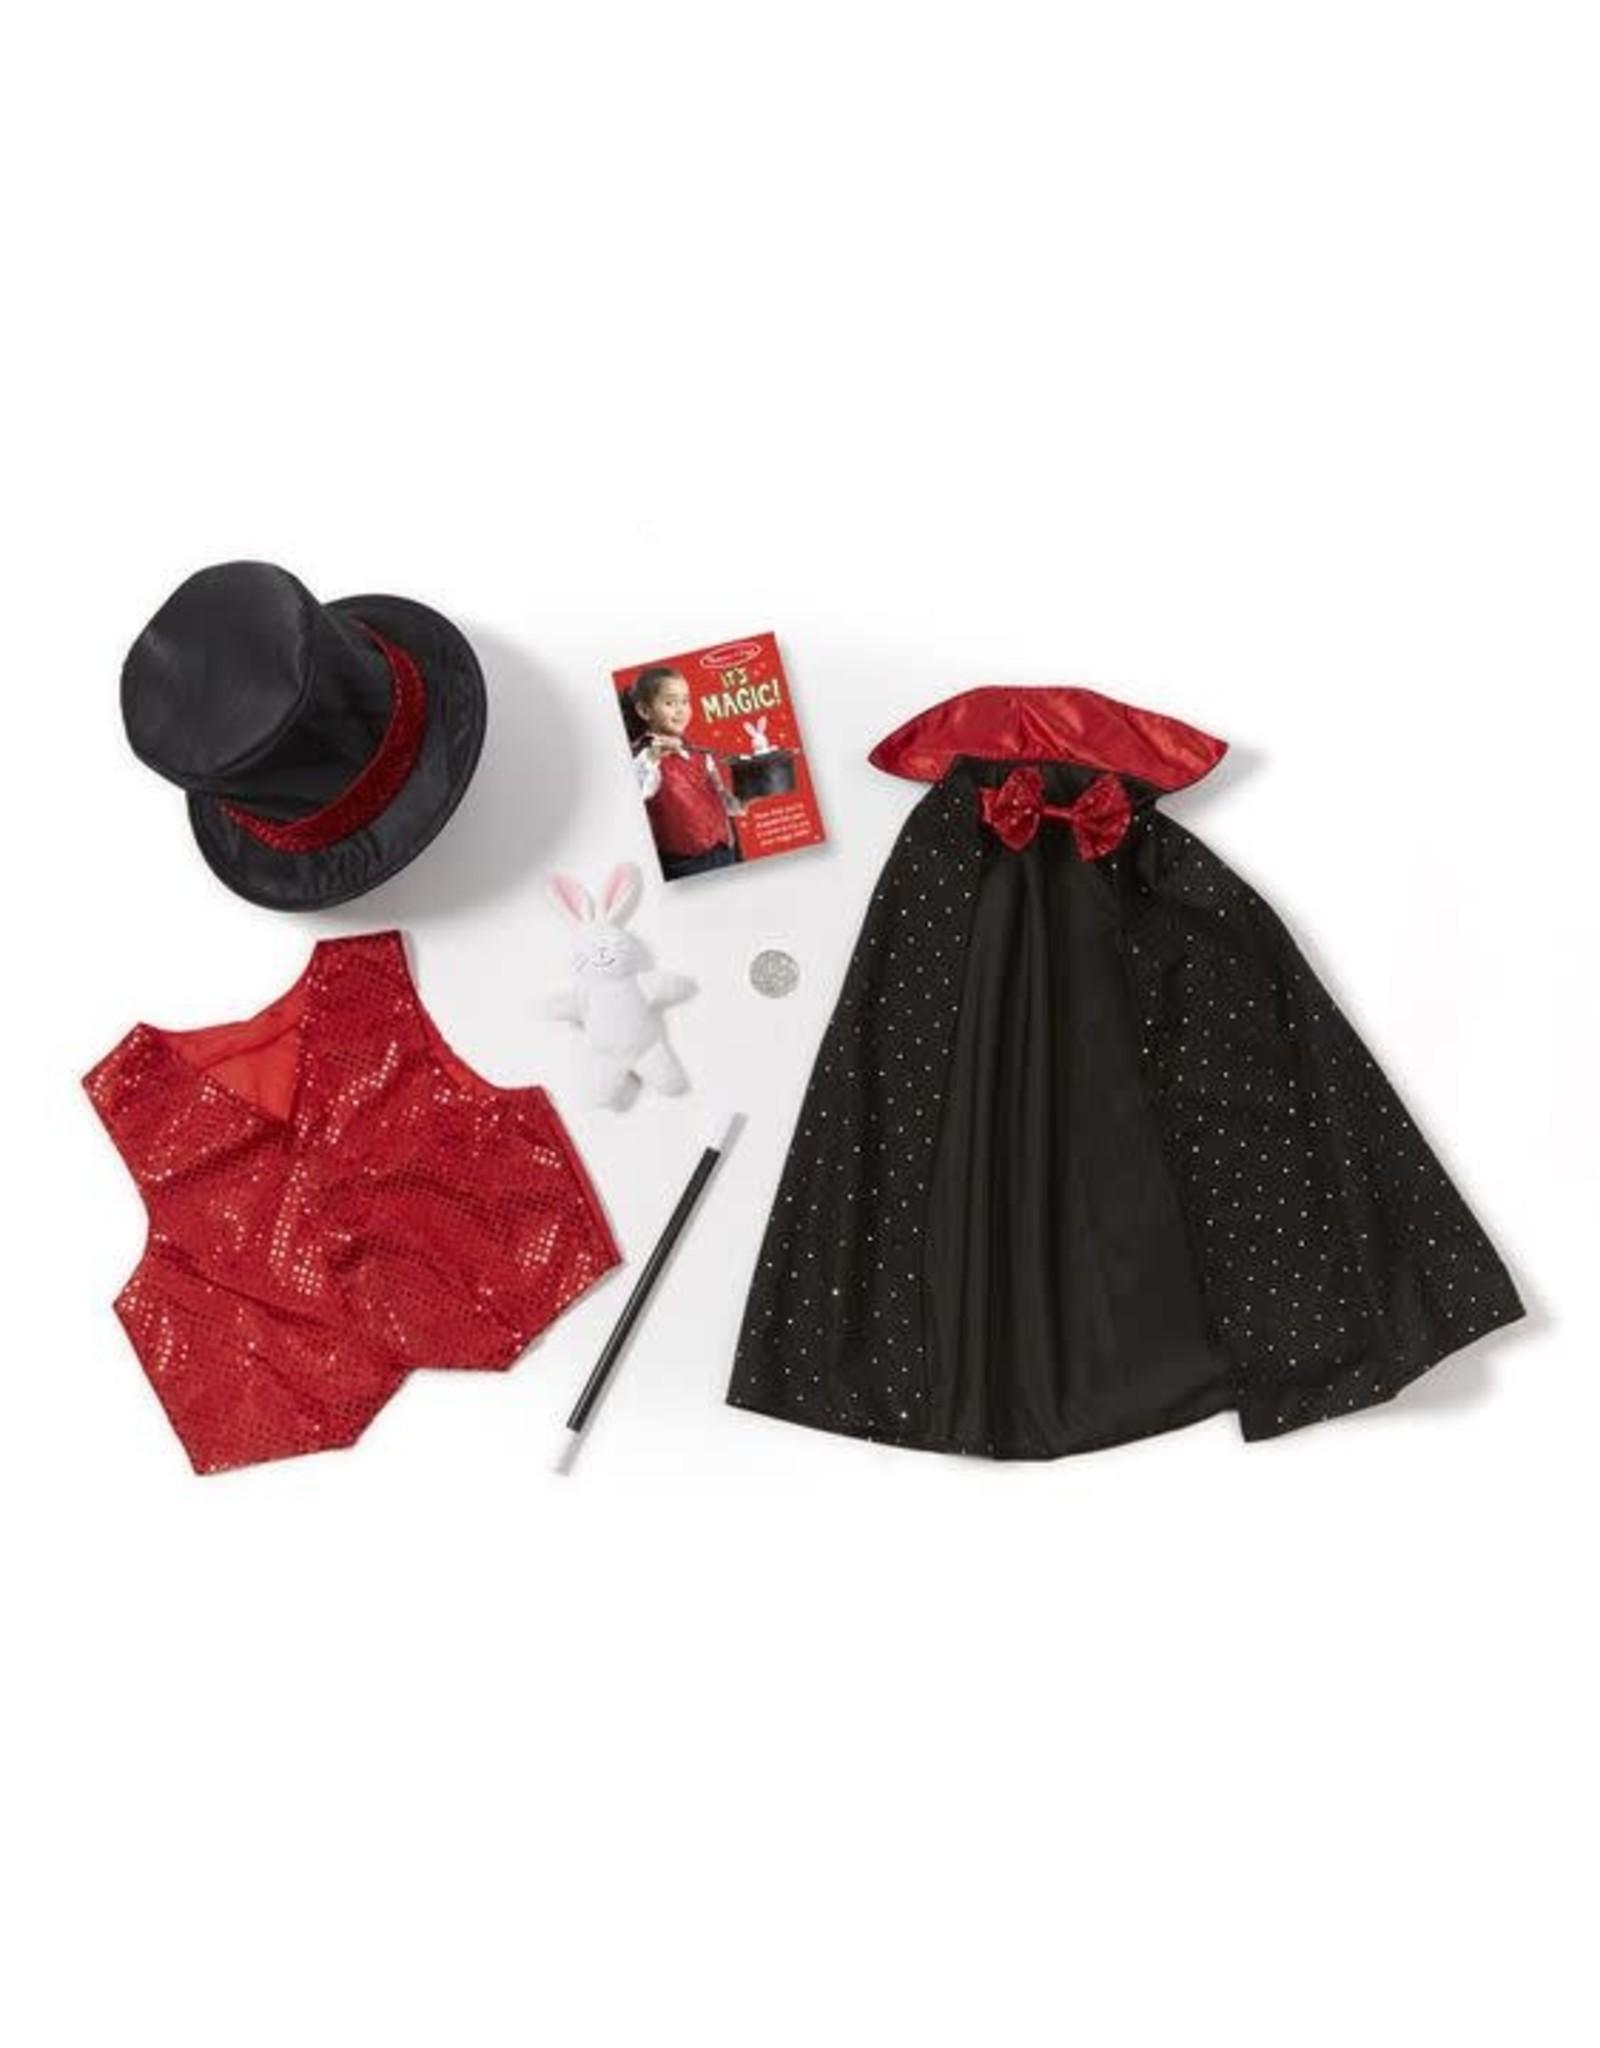 Melissa & Doug Magician Costume age 3-6